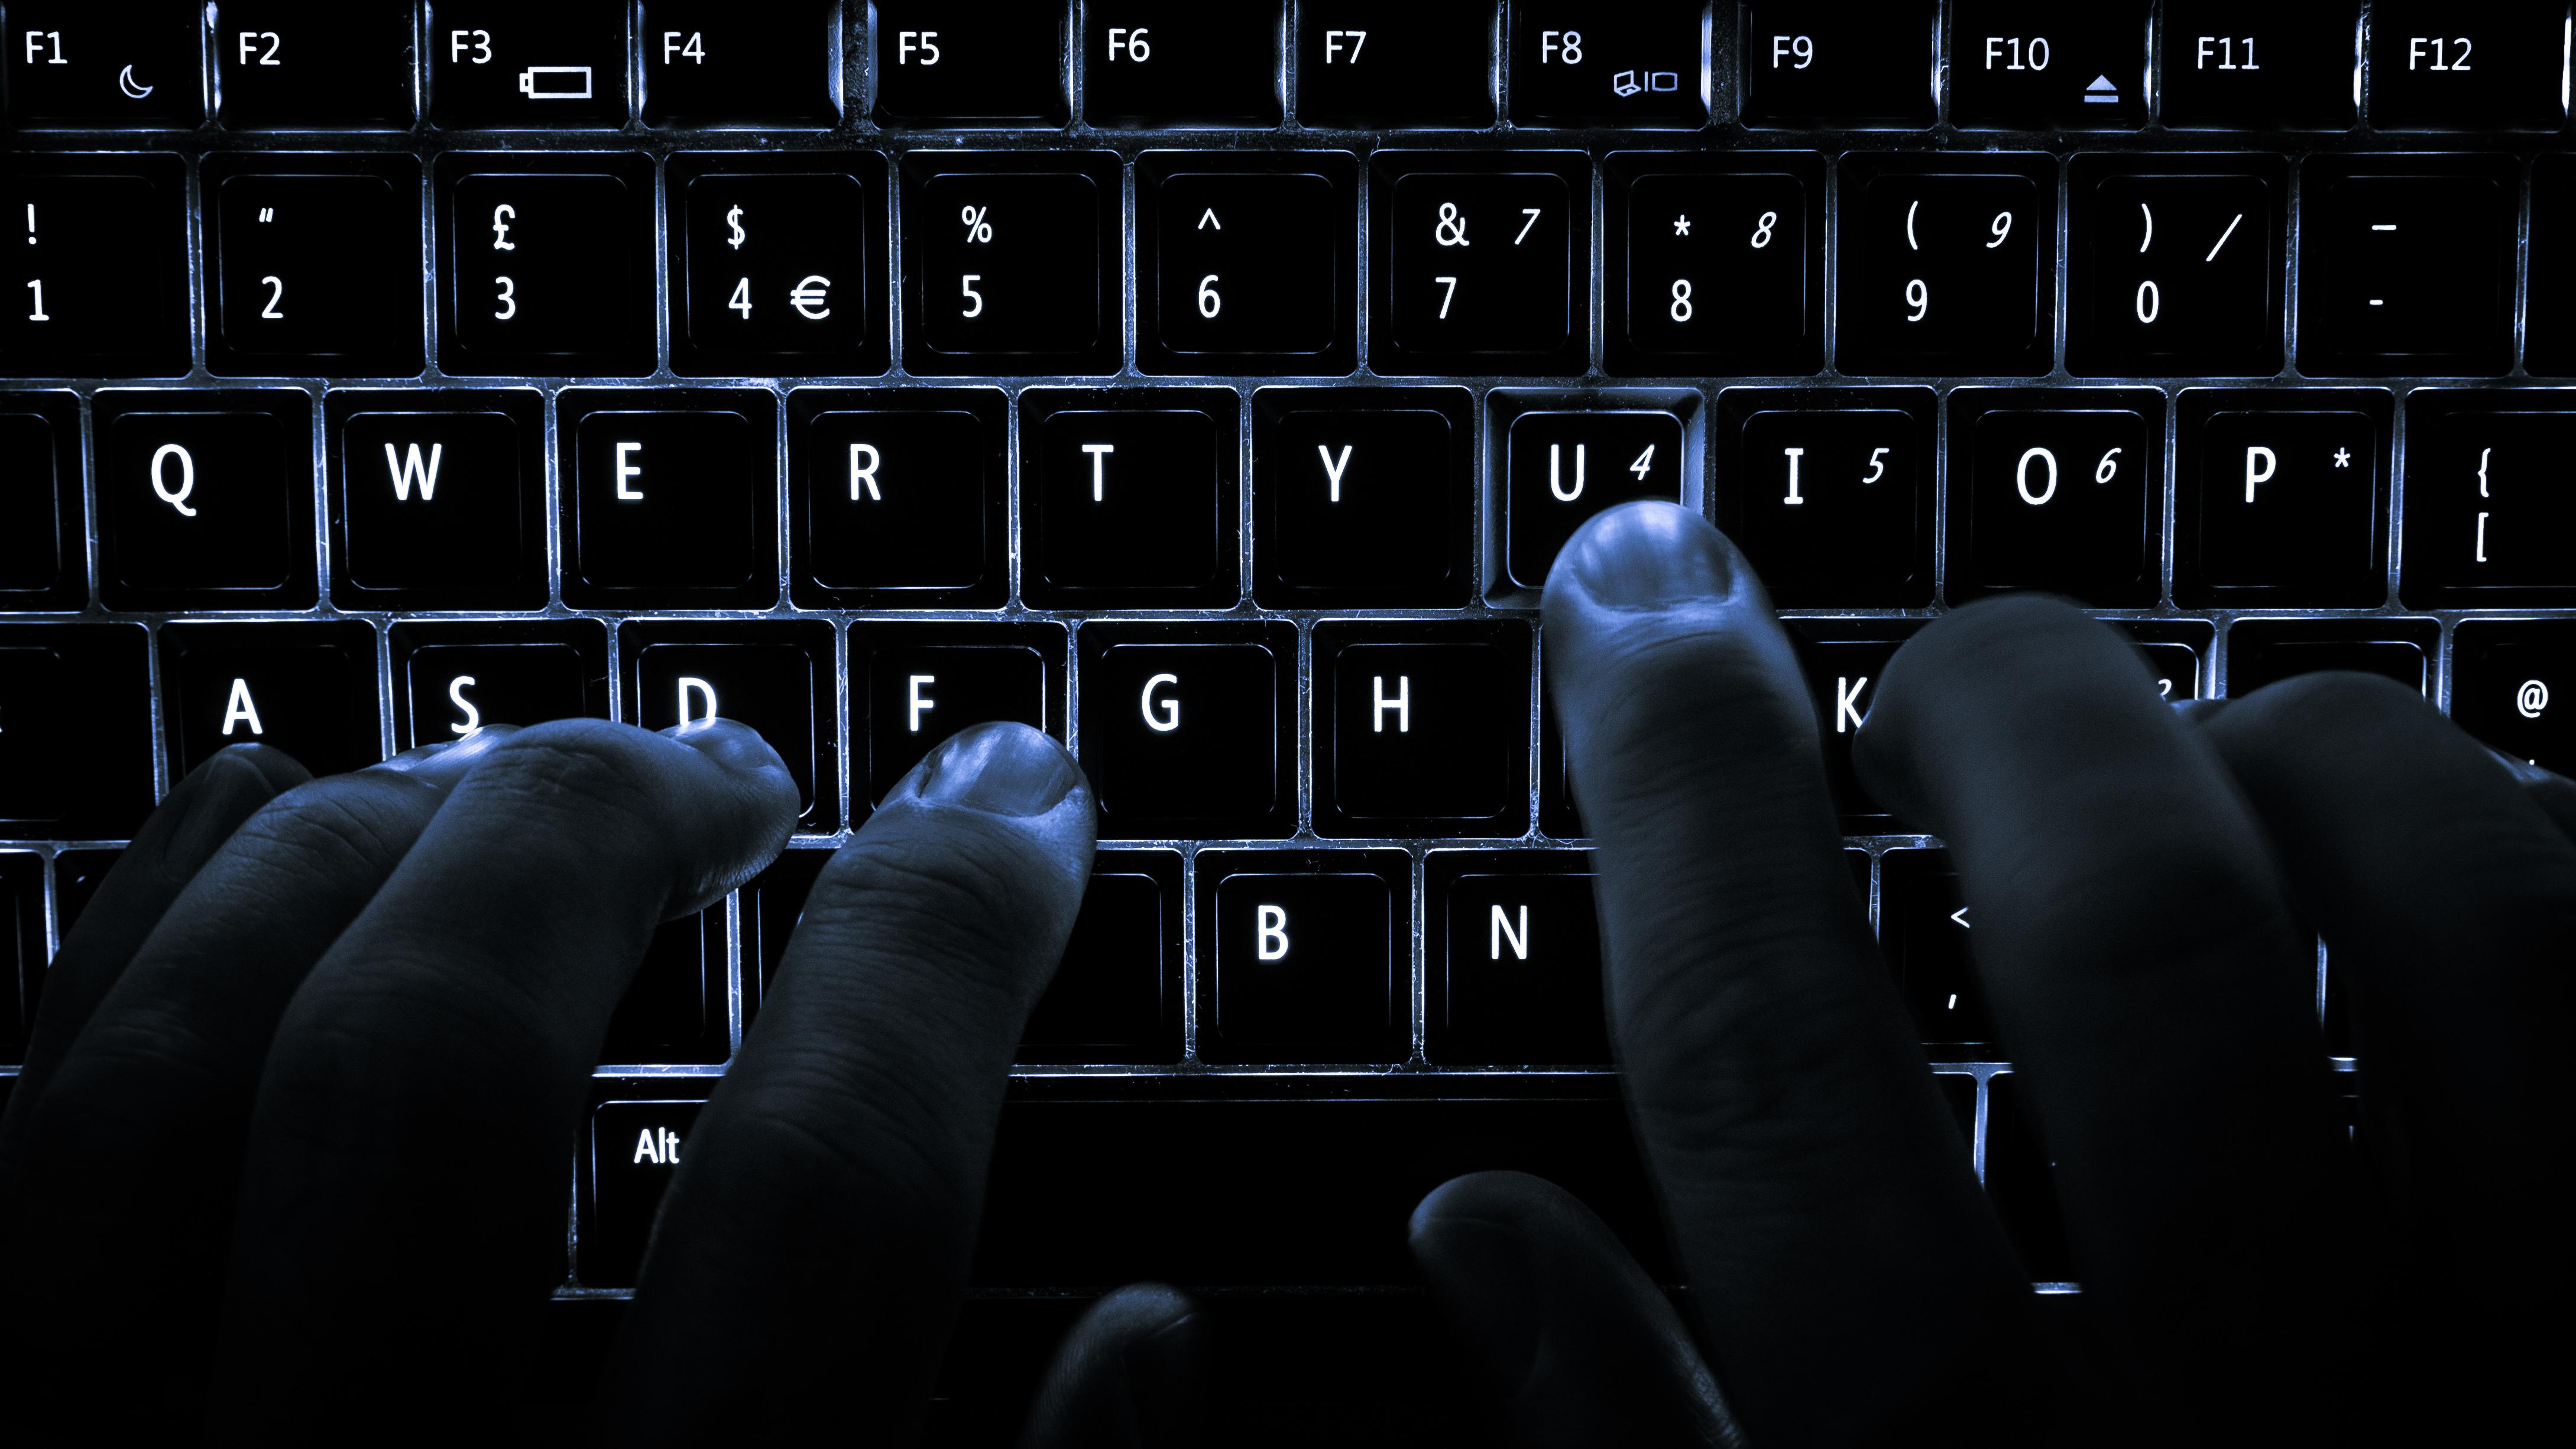 IMD promove evento voltado para hacker